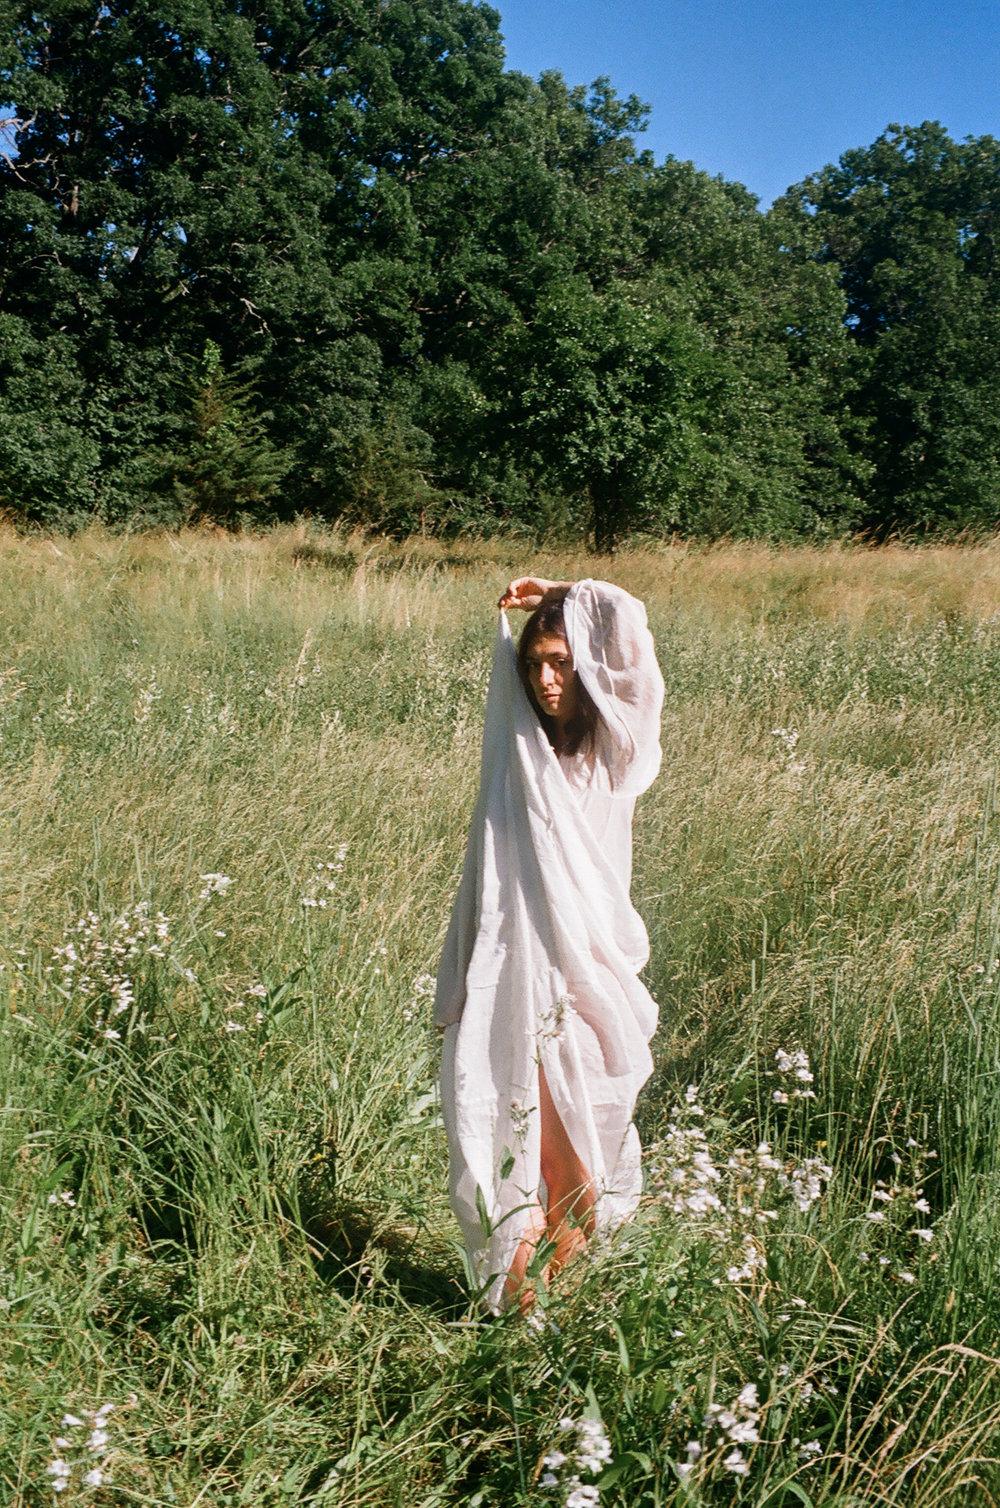 eitherand-anaak-summer-journal-16.jpg